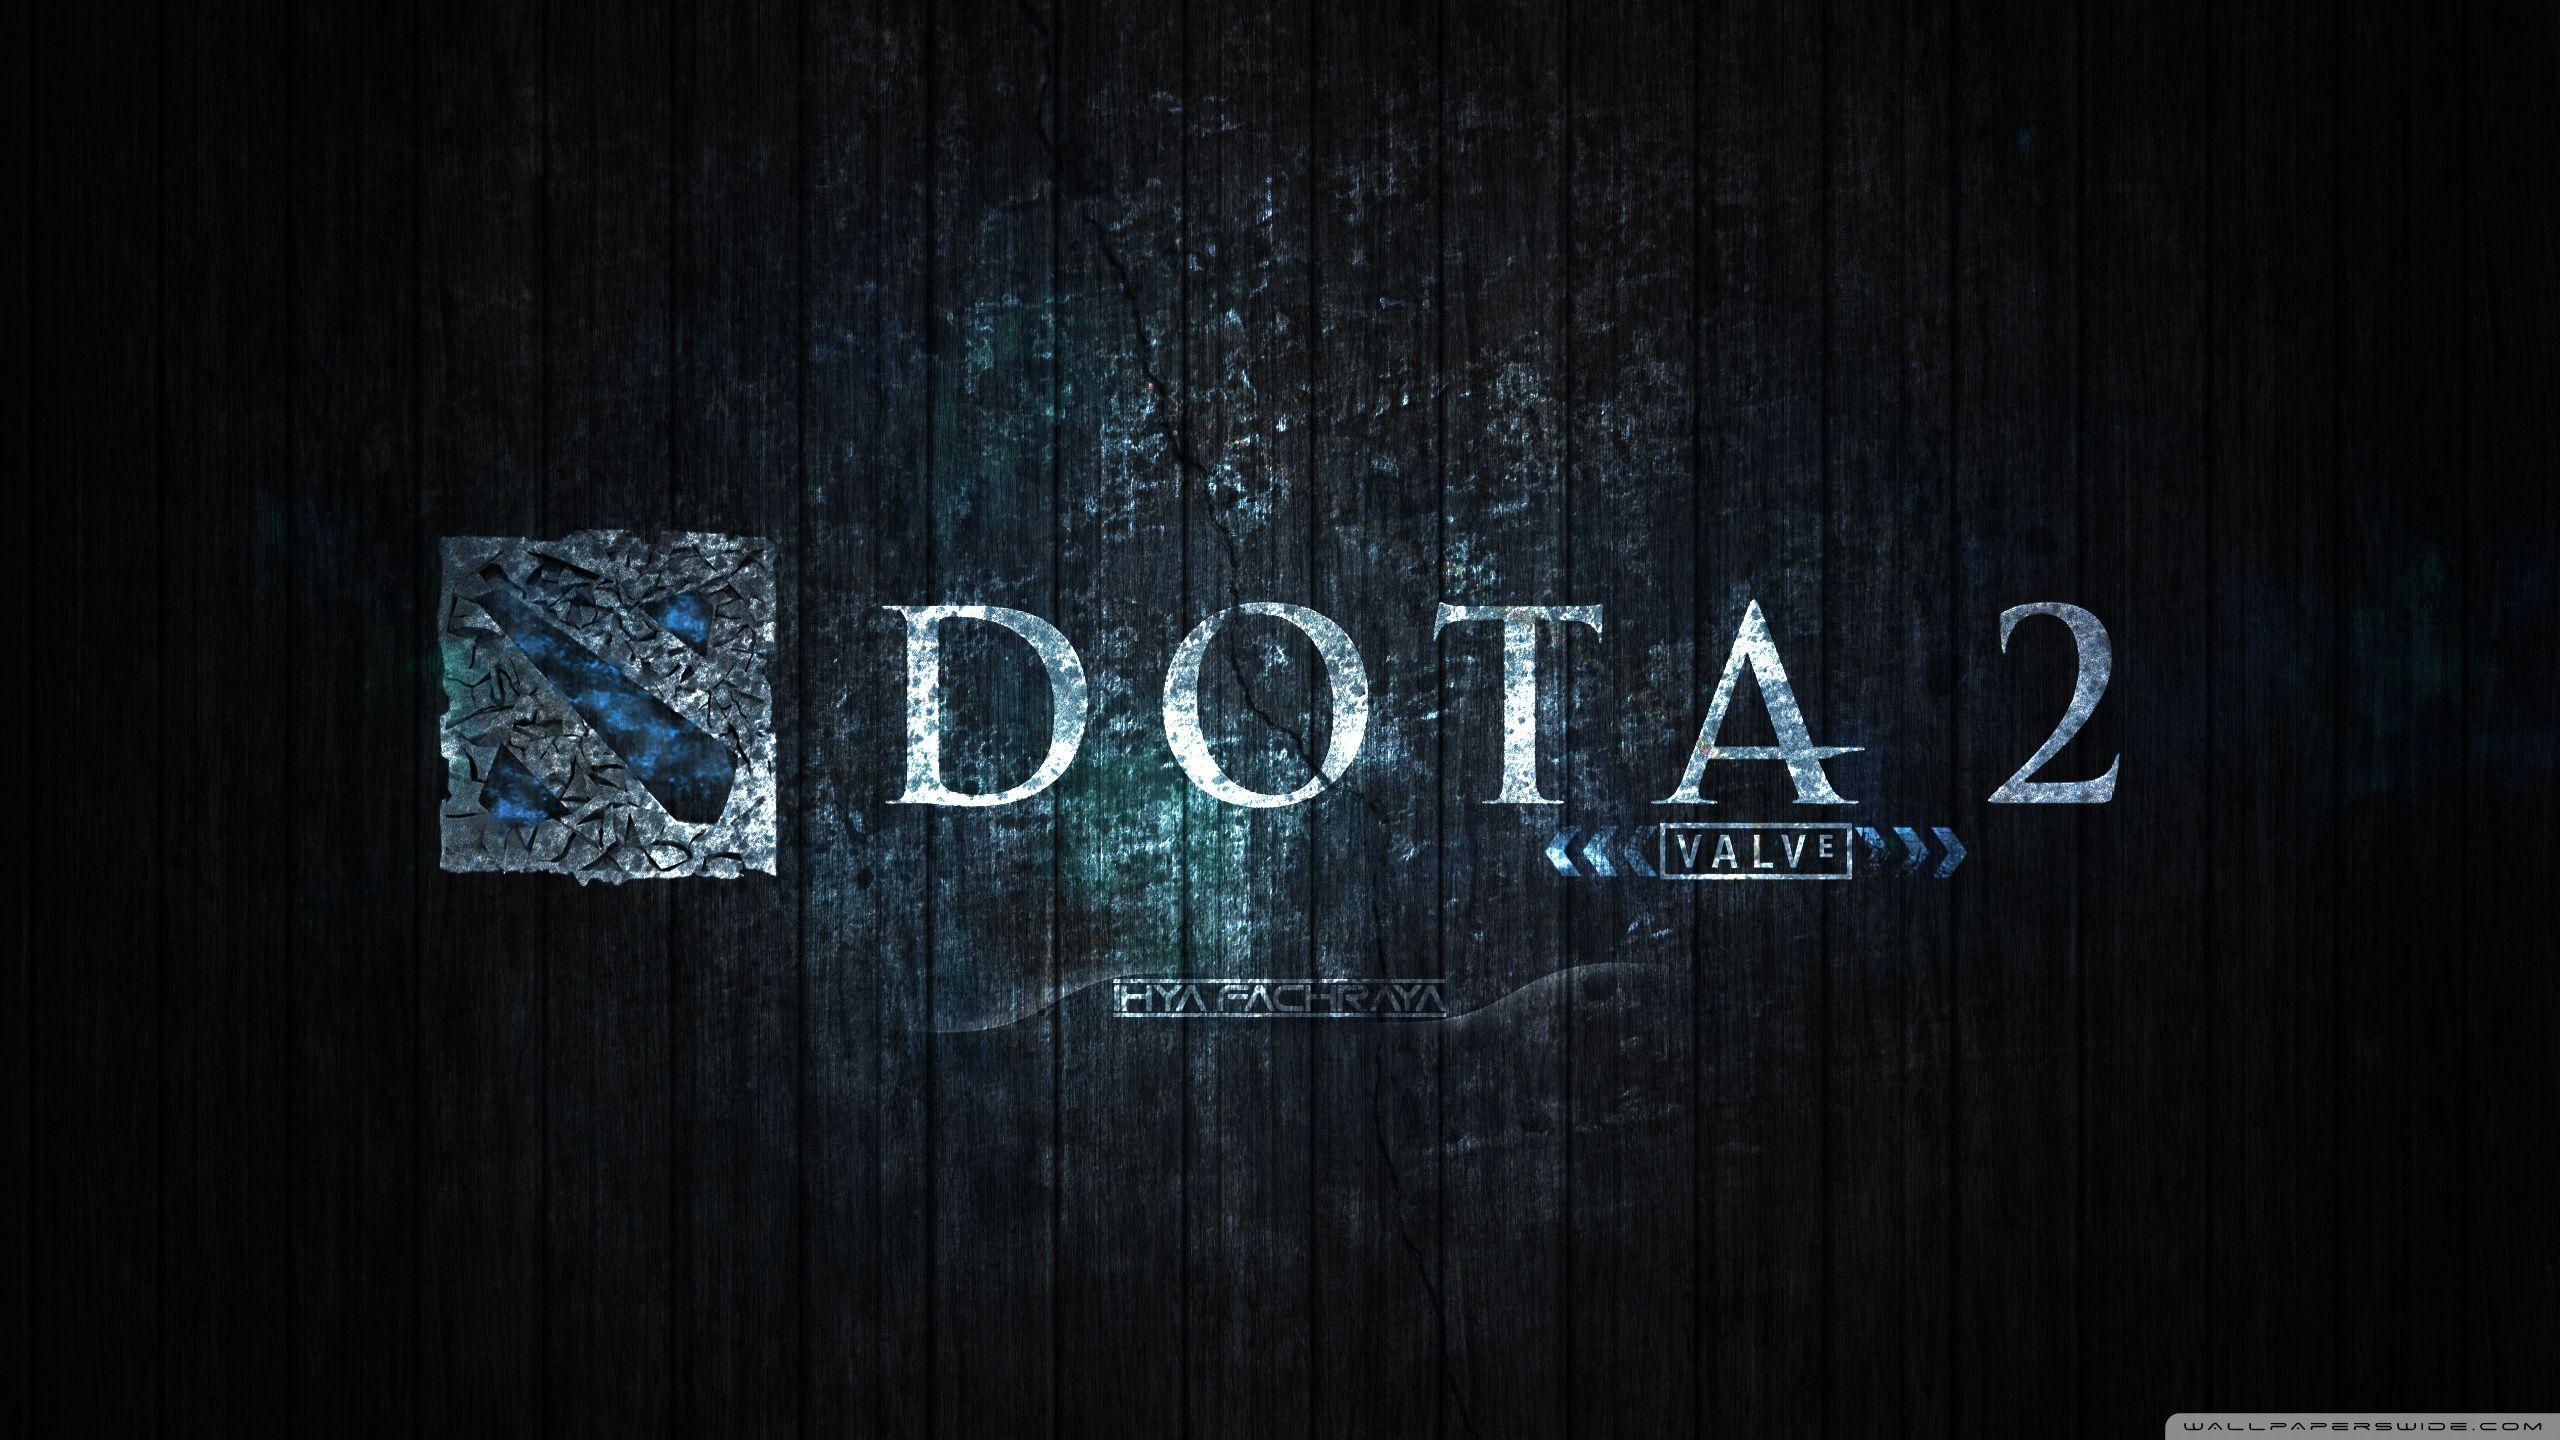 Dota 2 Logo Wallpaper Free Dota 2 Logo Dota 2 Wallpaper Dota 2